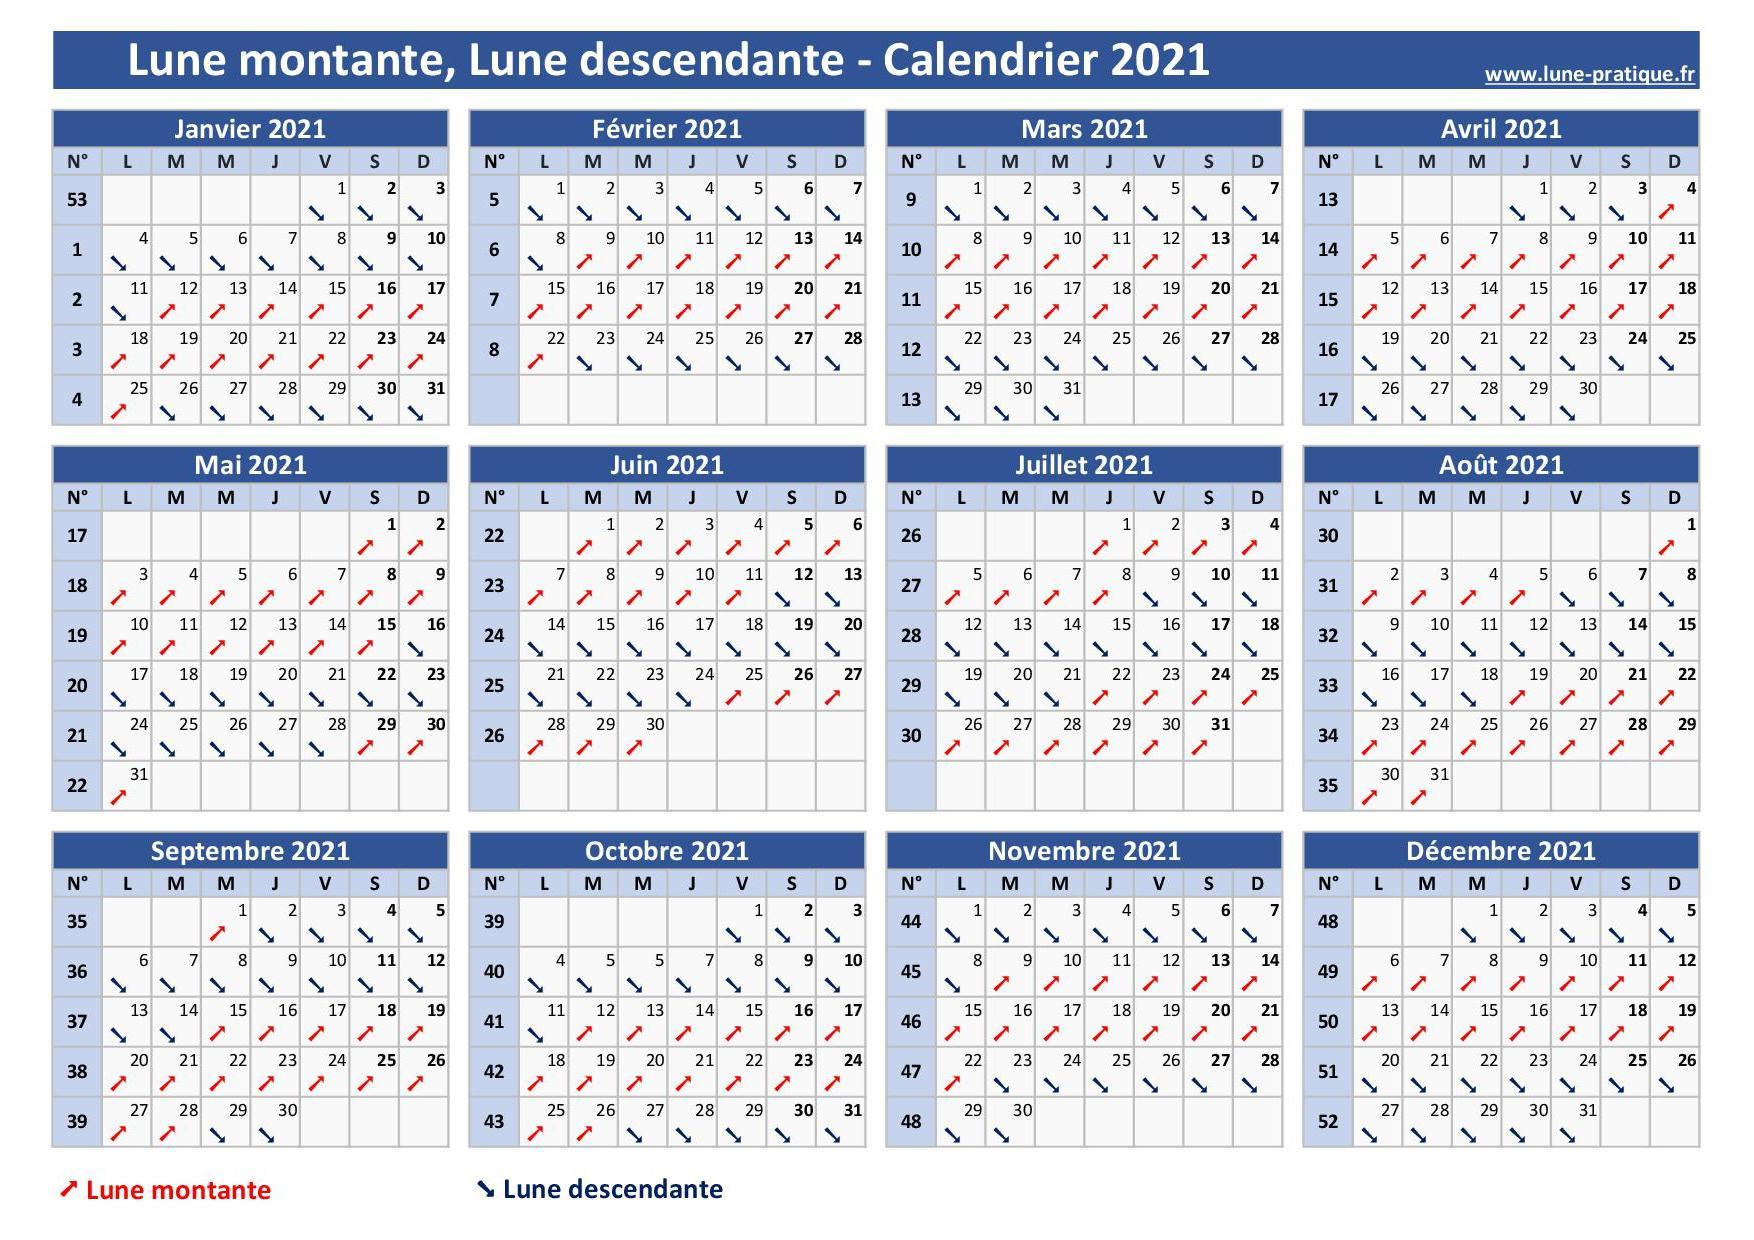 Calendrier Lunaire Jardin Mars 2022 Lune montante 🌙   Lune descendante : Calendrier lunaire 2021